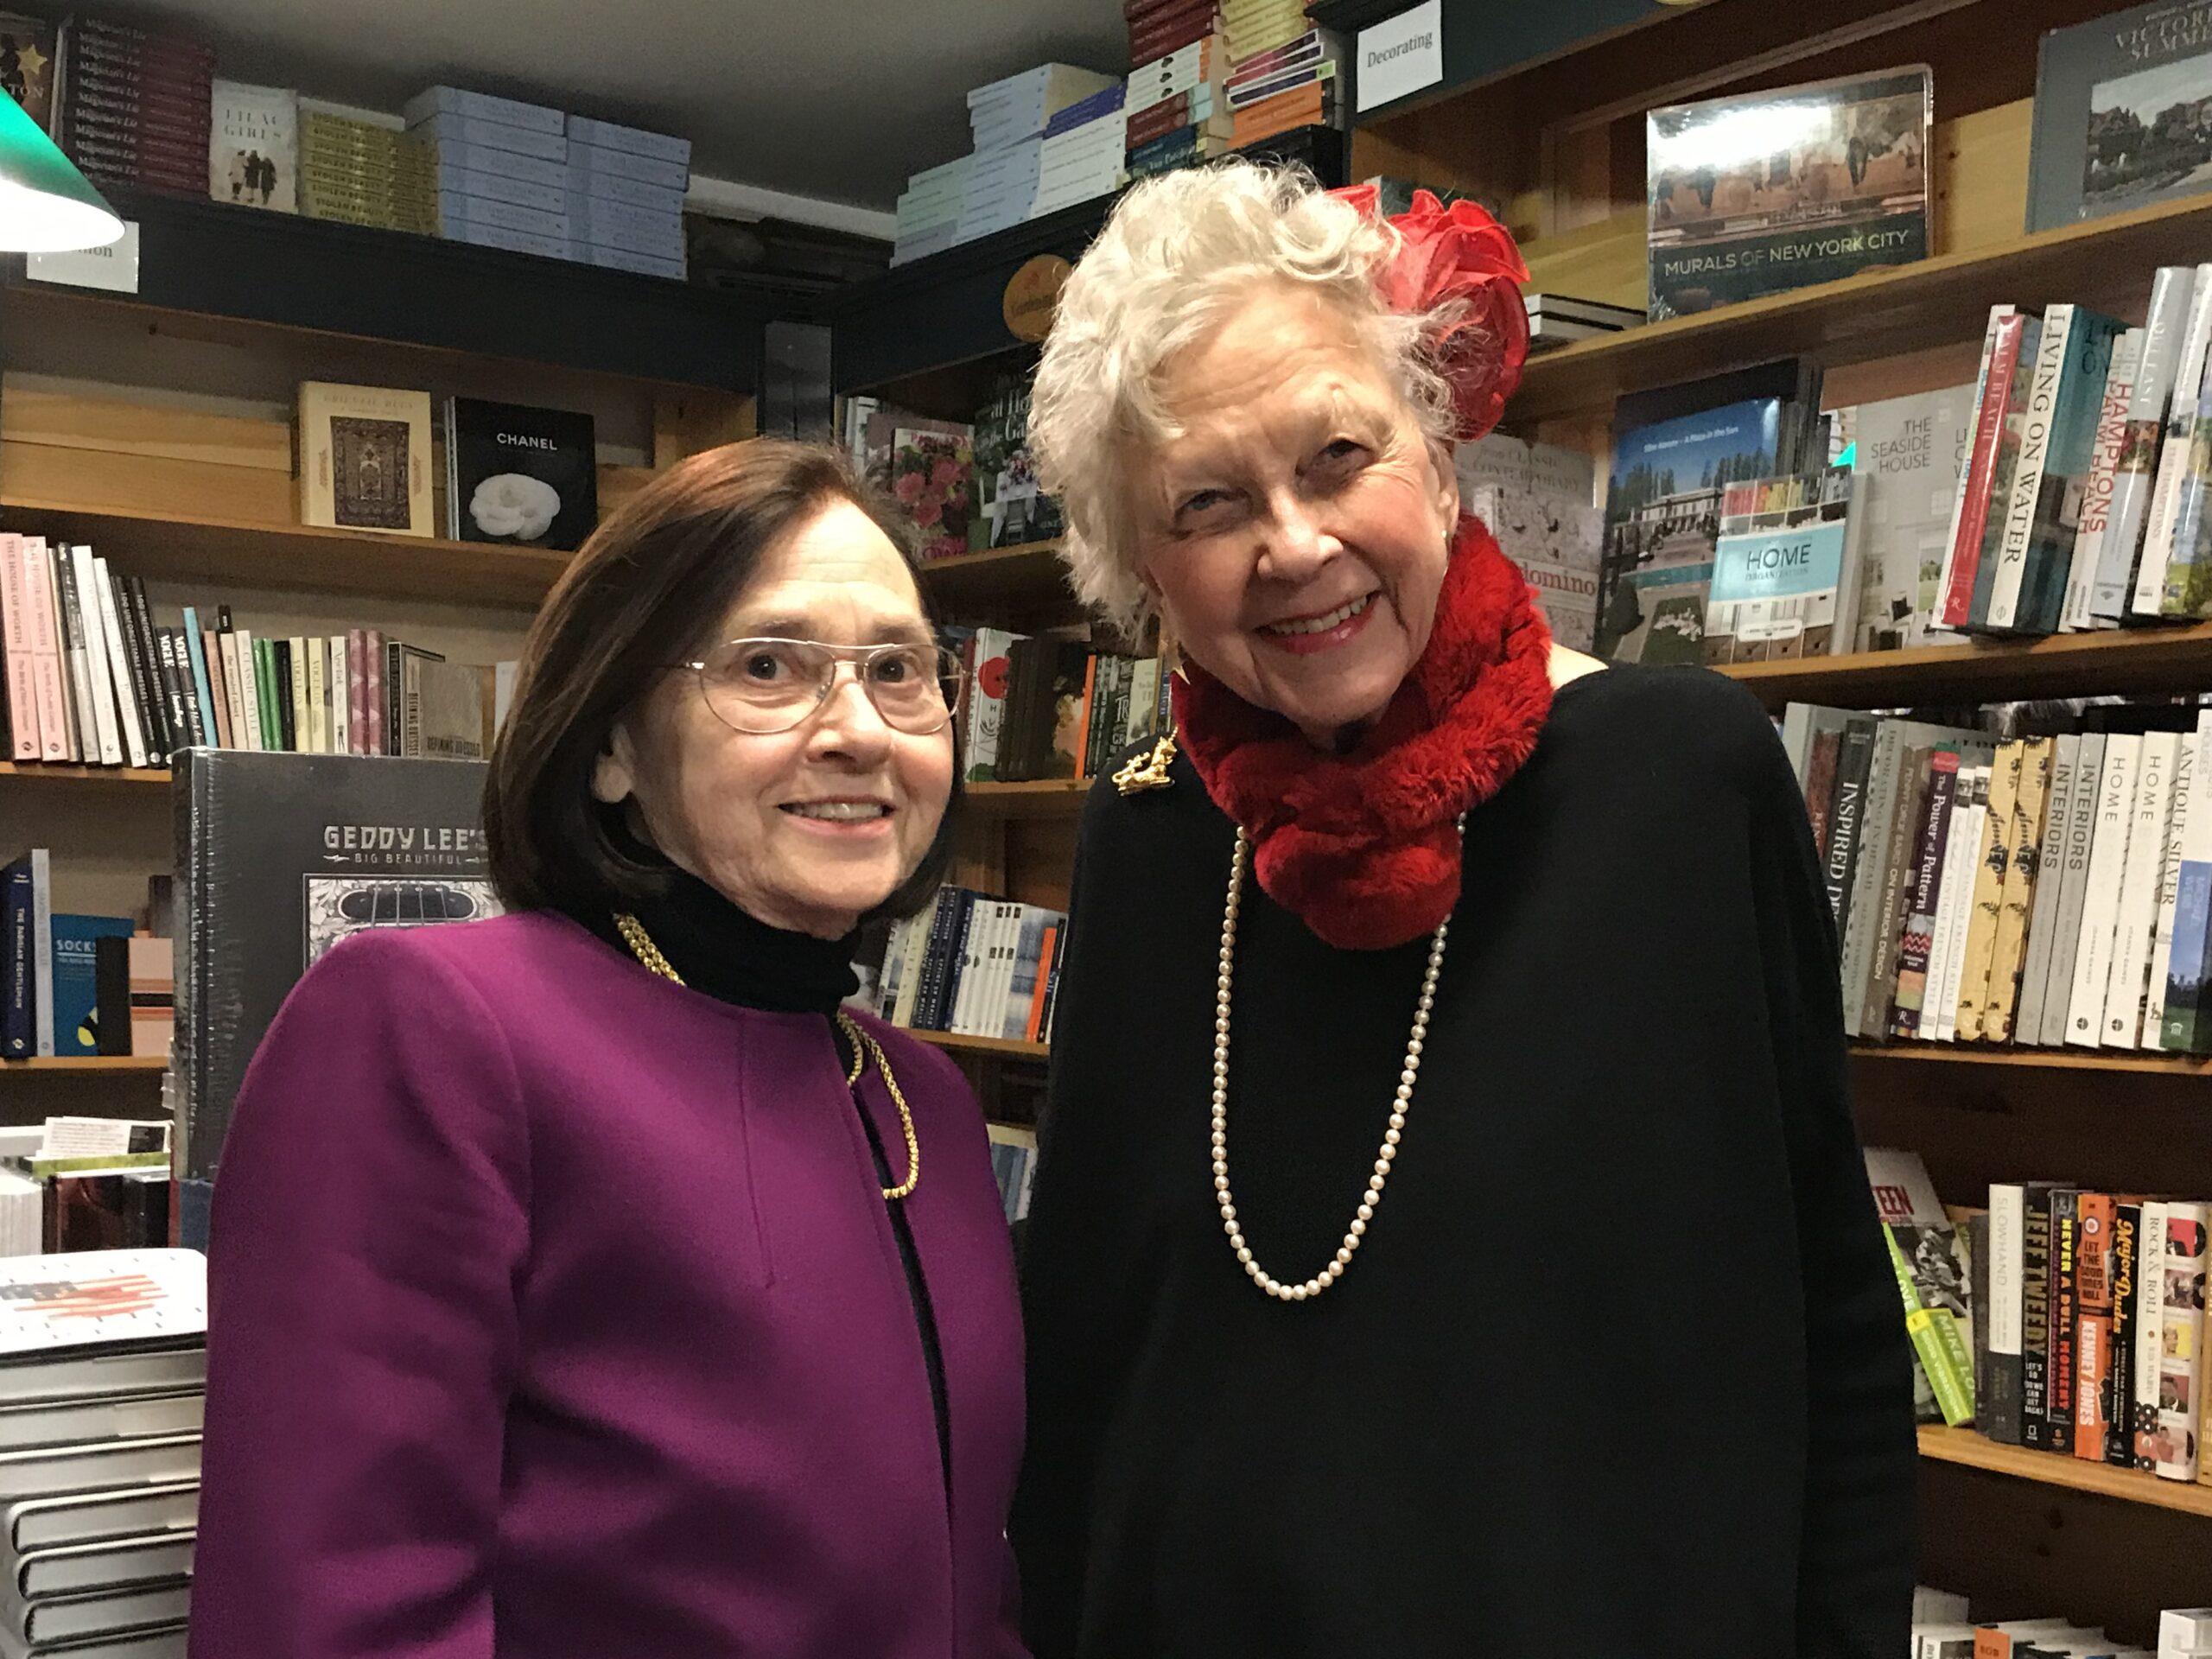 Anderson Guide to Greenwich: Diane's Books